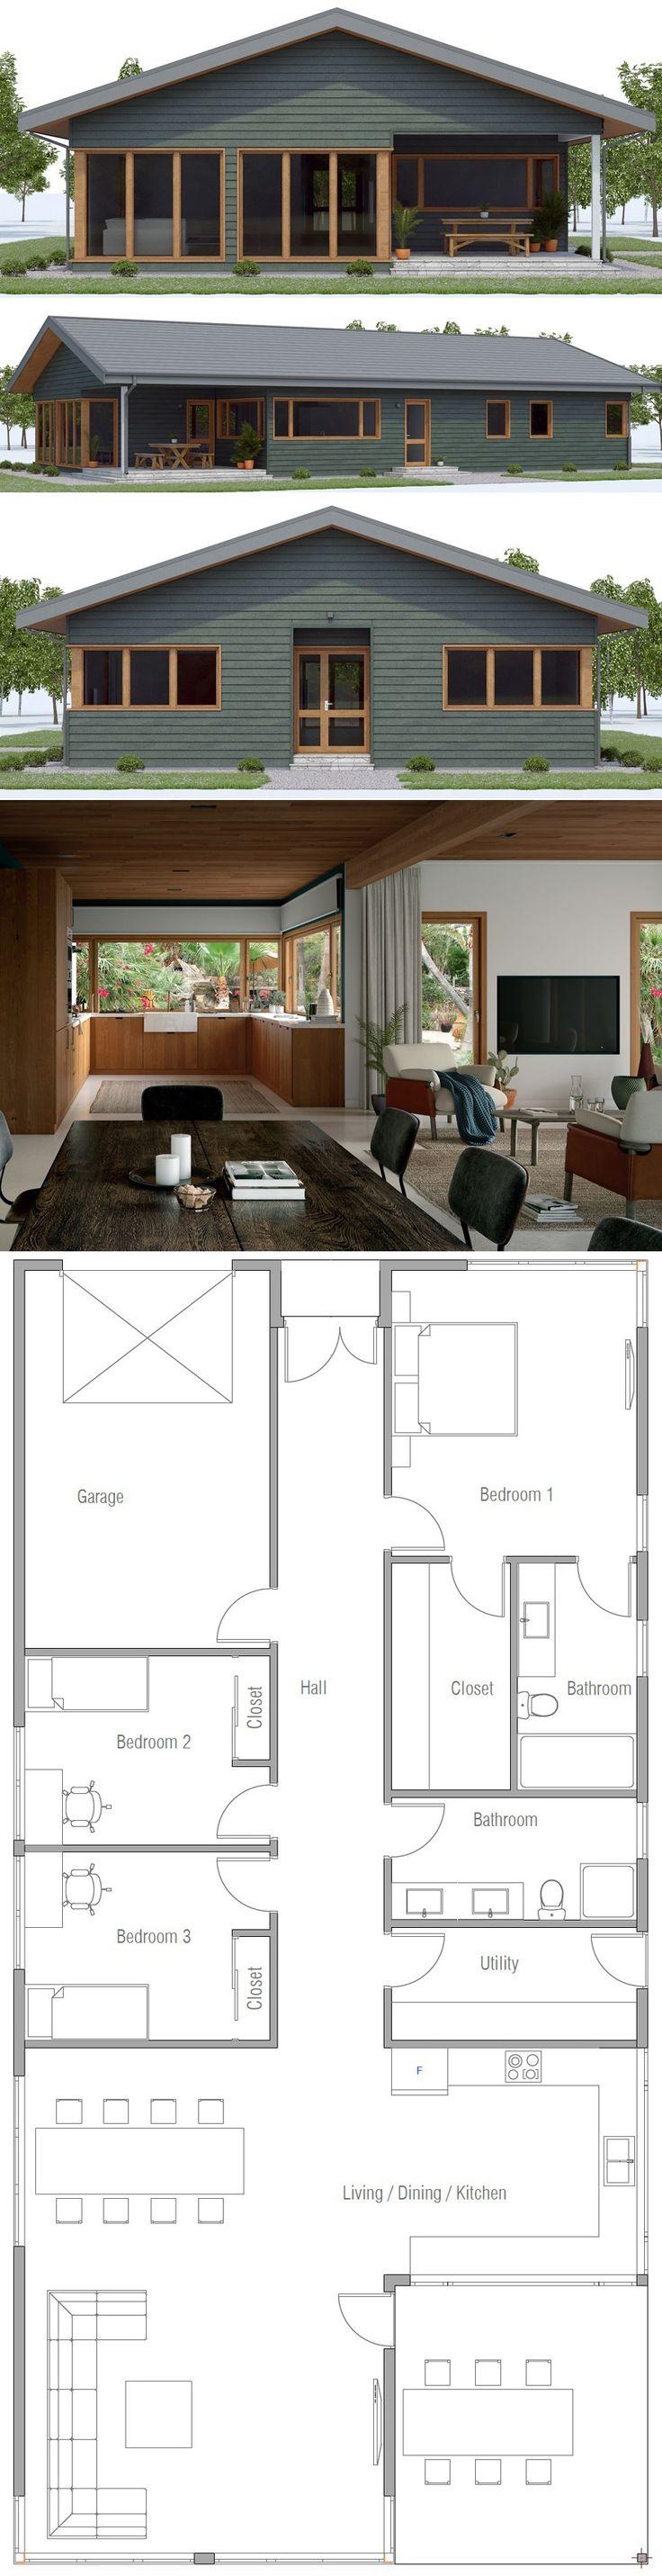 Home Plan CH566